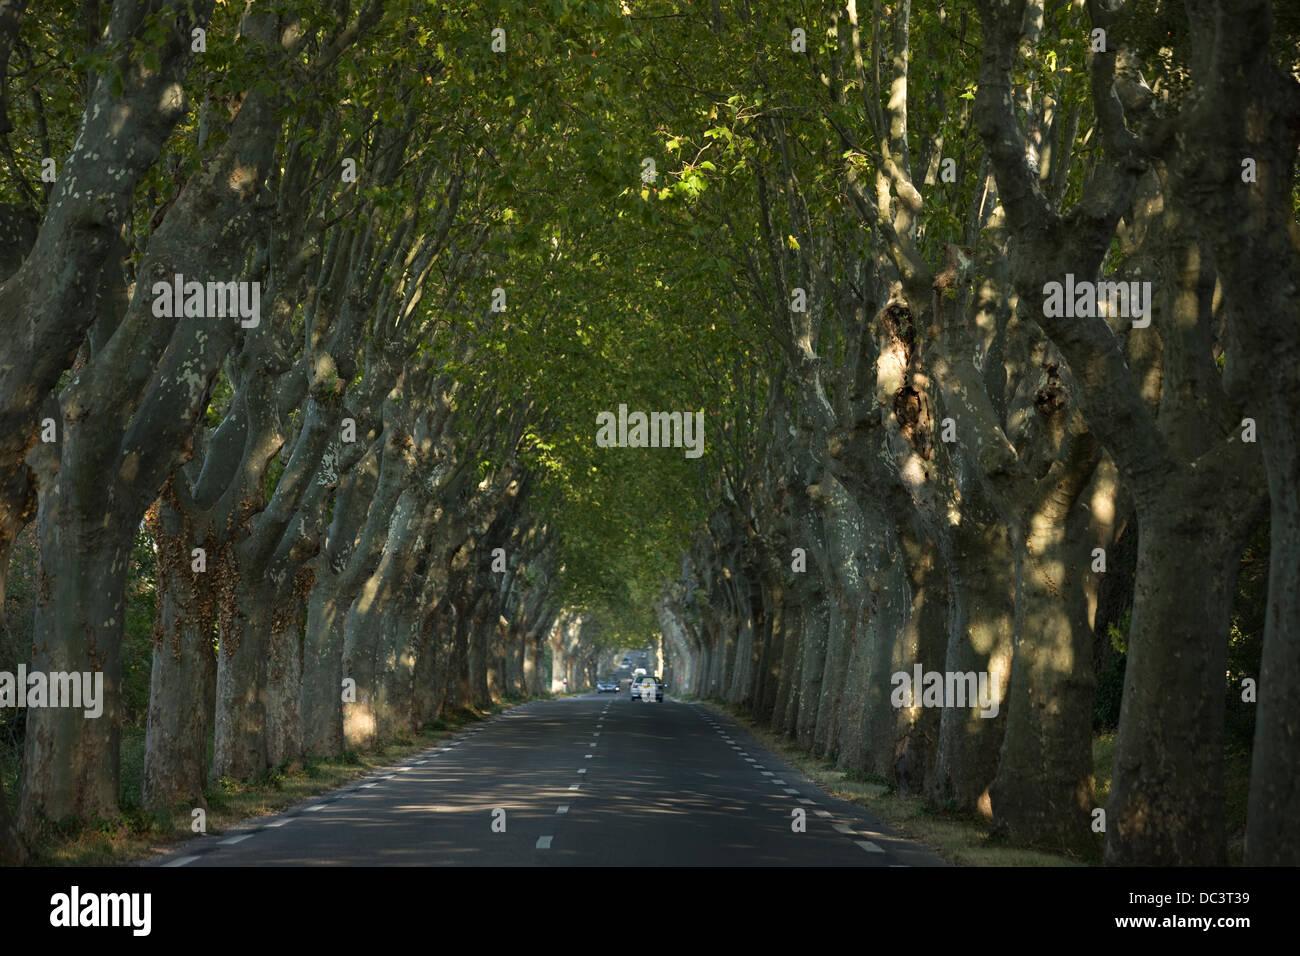 La ruta D99 Sycamore arbolada calle SAINT REMY DE PROVENCE FRANCIA Foto de stock